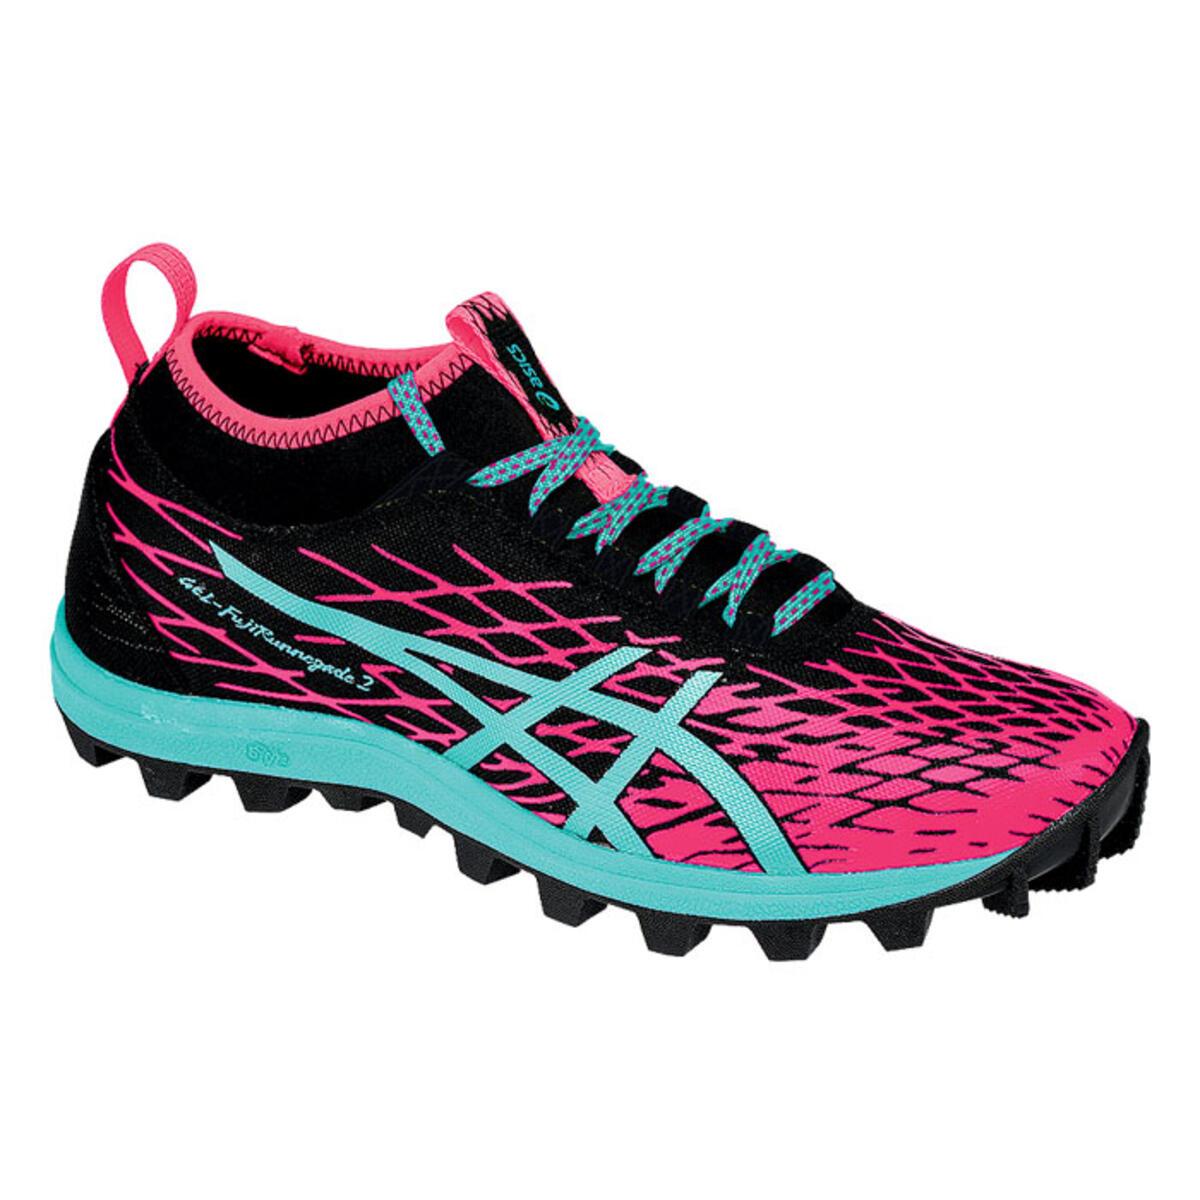 Asics Women's Gel fujiRunnegade 2 Running Shoes